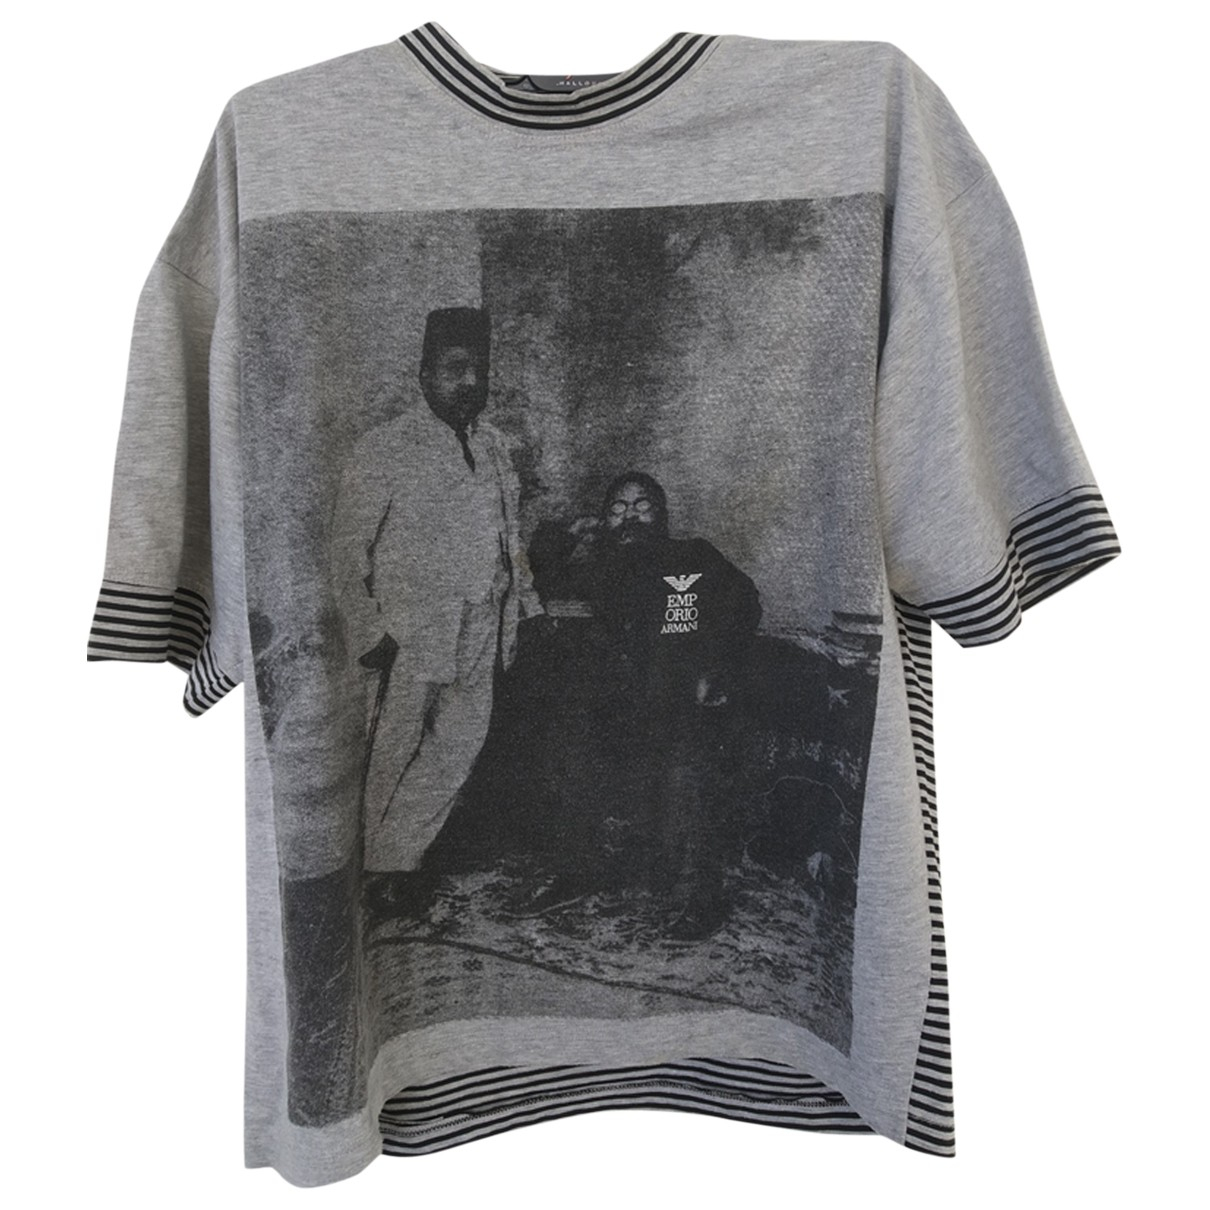 Emporio Armani - Tee shirts   pour homme en coton - gris